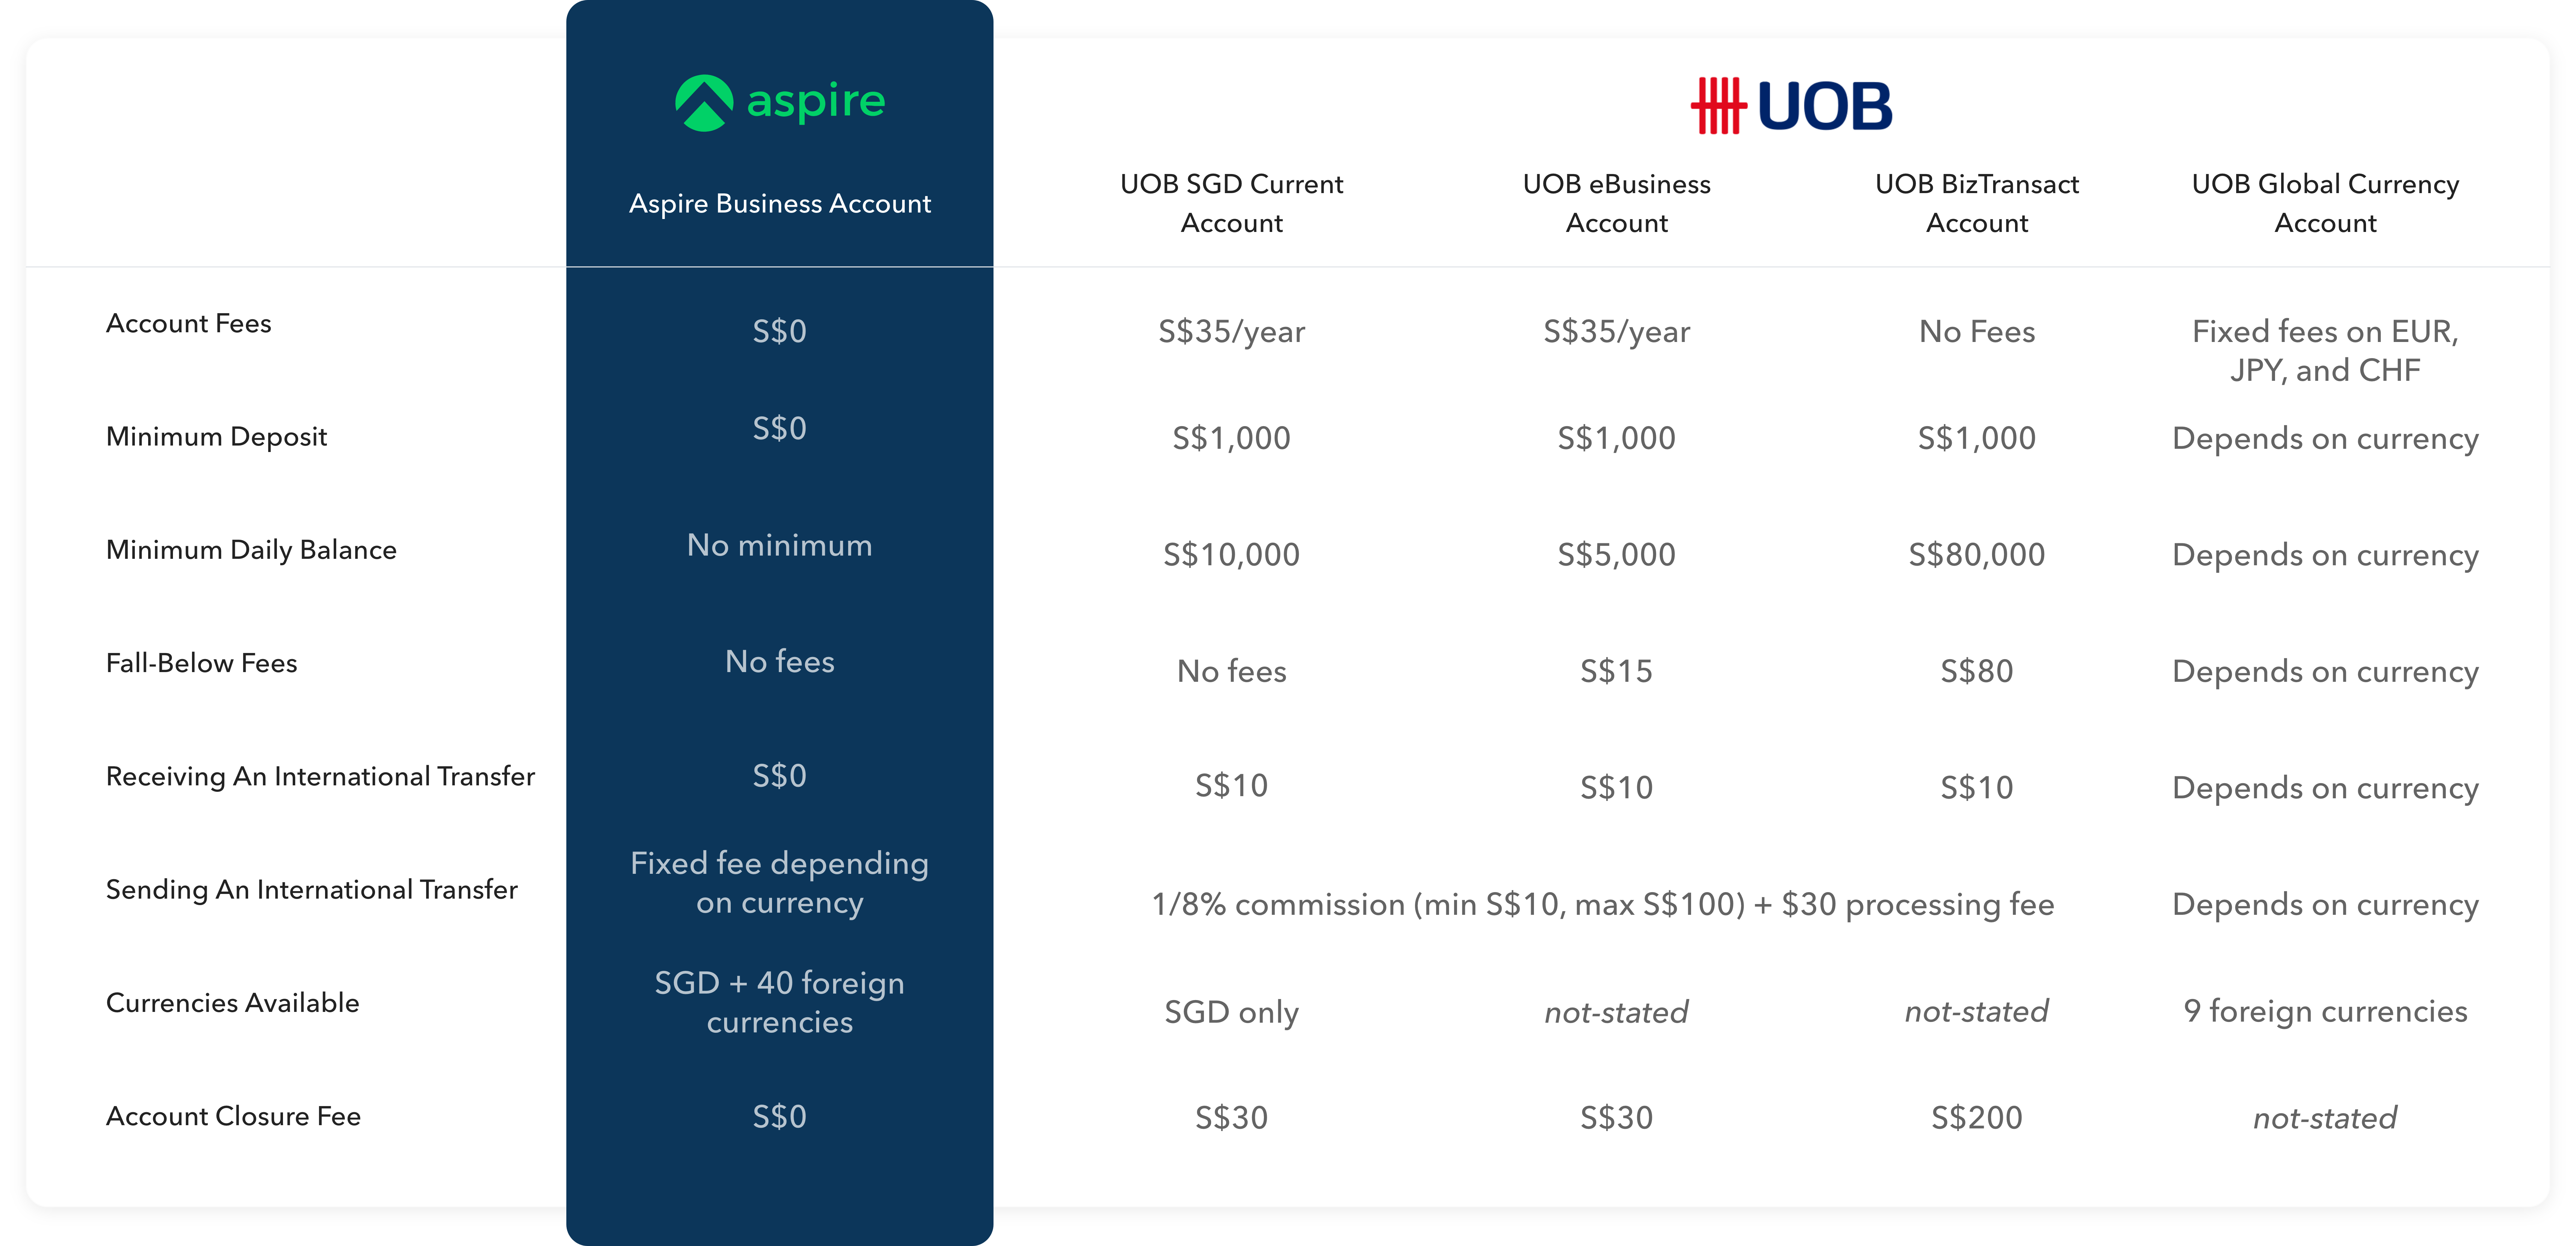 uob ebusiness account vs